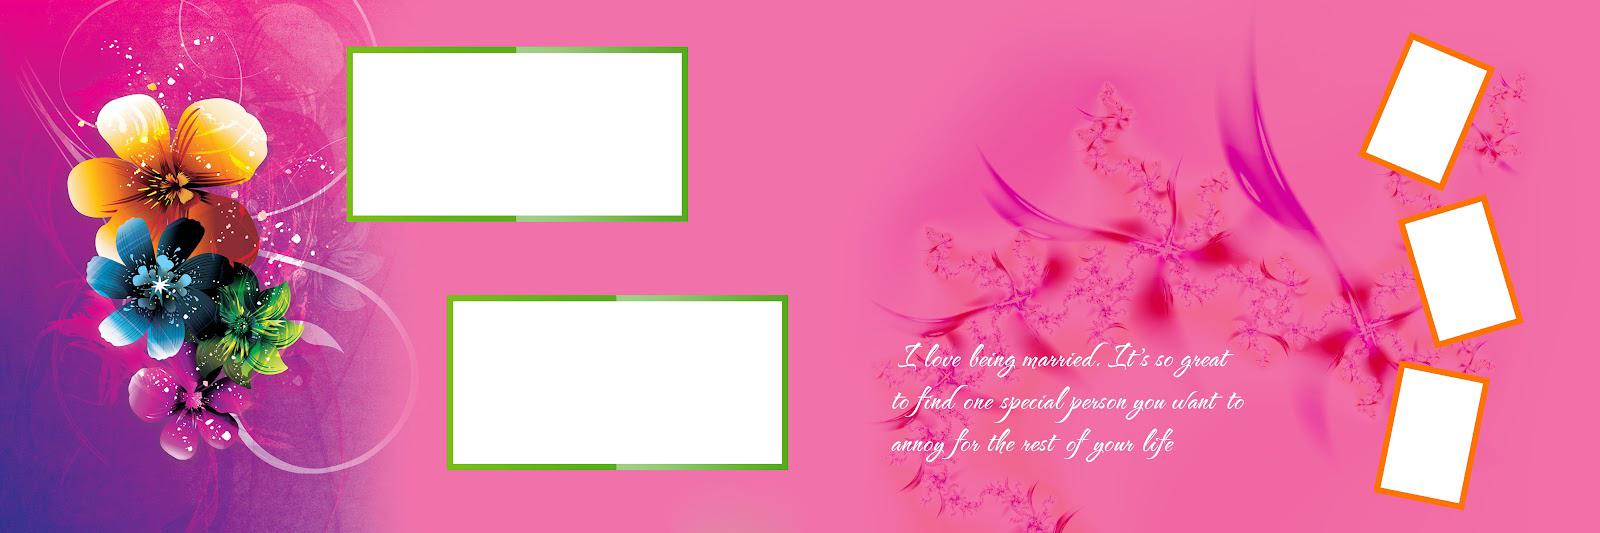 Jamali Web: New Photo Album Frame - Latest karizma album templates ...